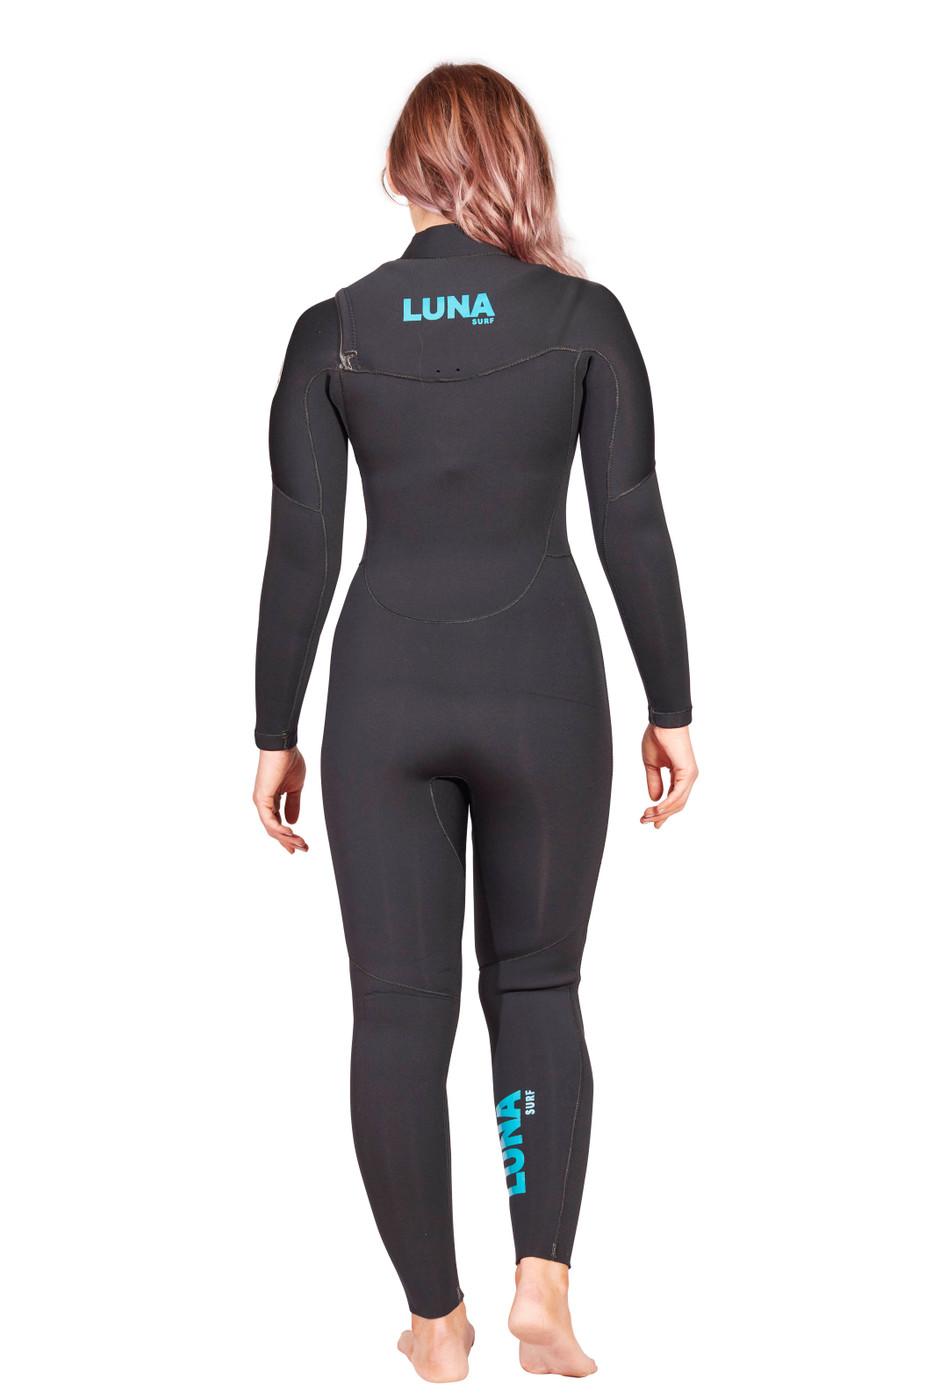 Lunasurf Womens 4.3mm Slant Zip Yamamoto Wetsuit